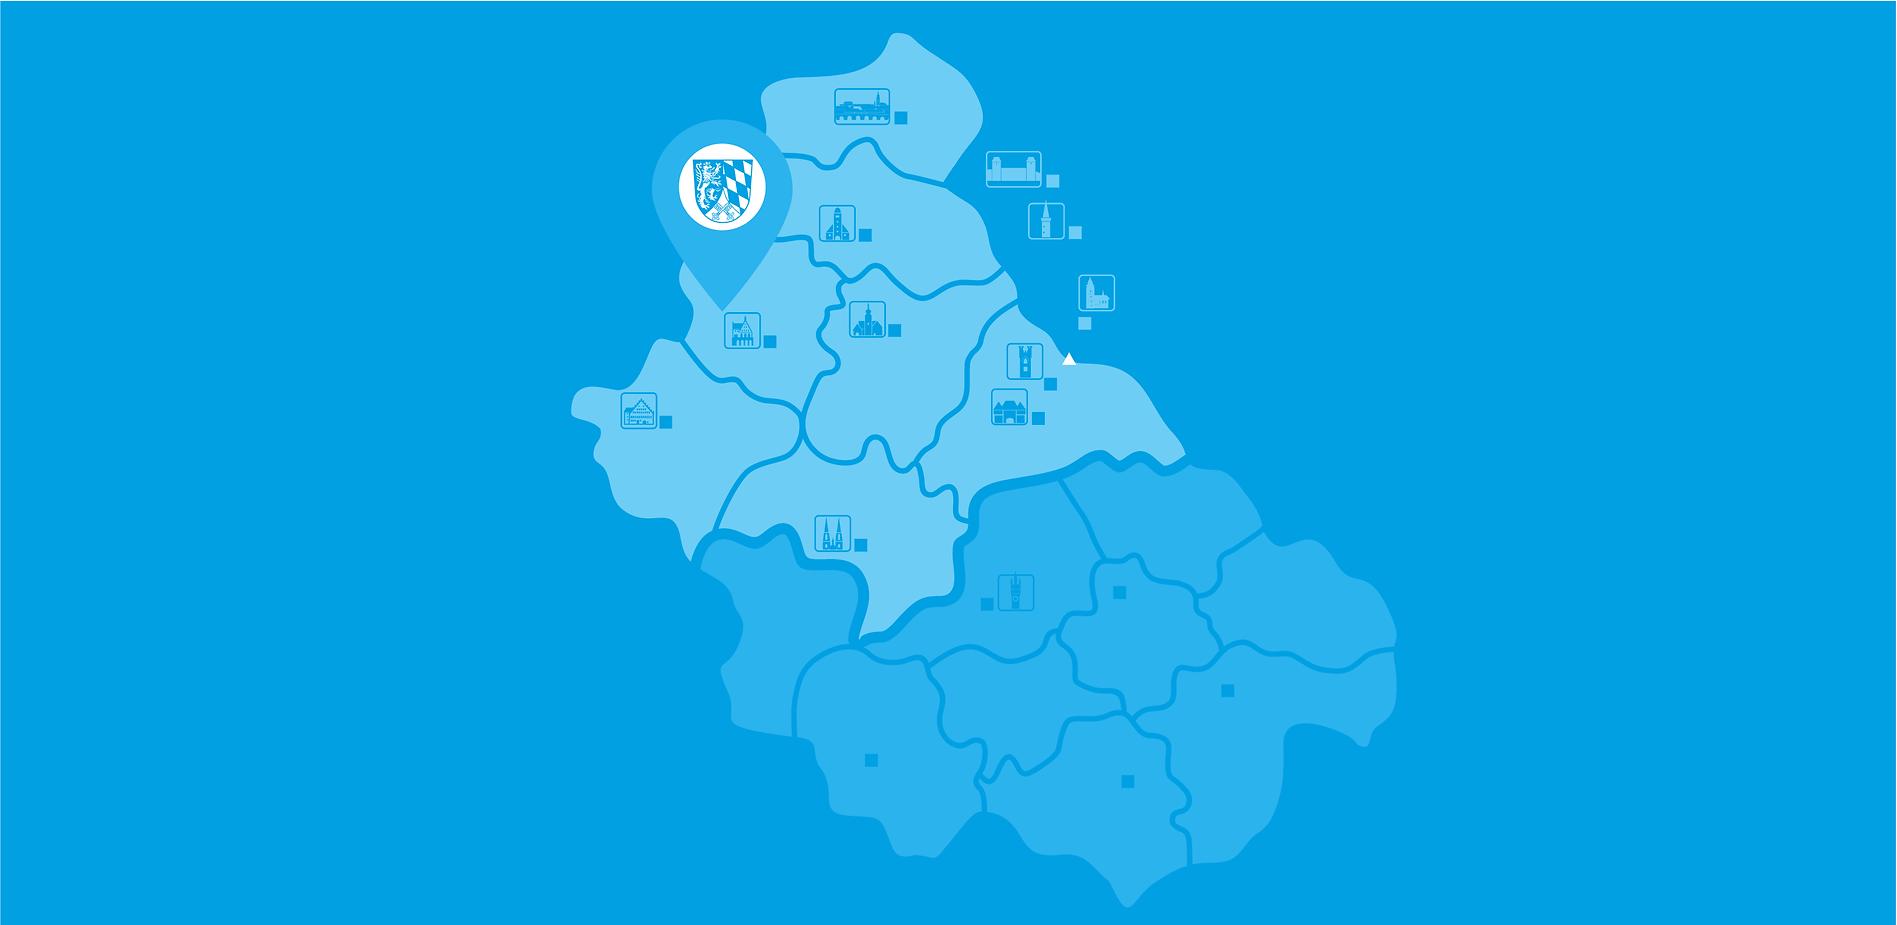 Oberpfalz_mapa_NEW.png